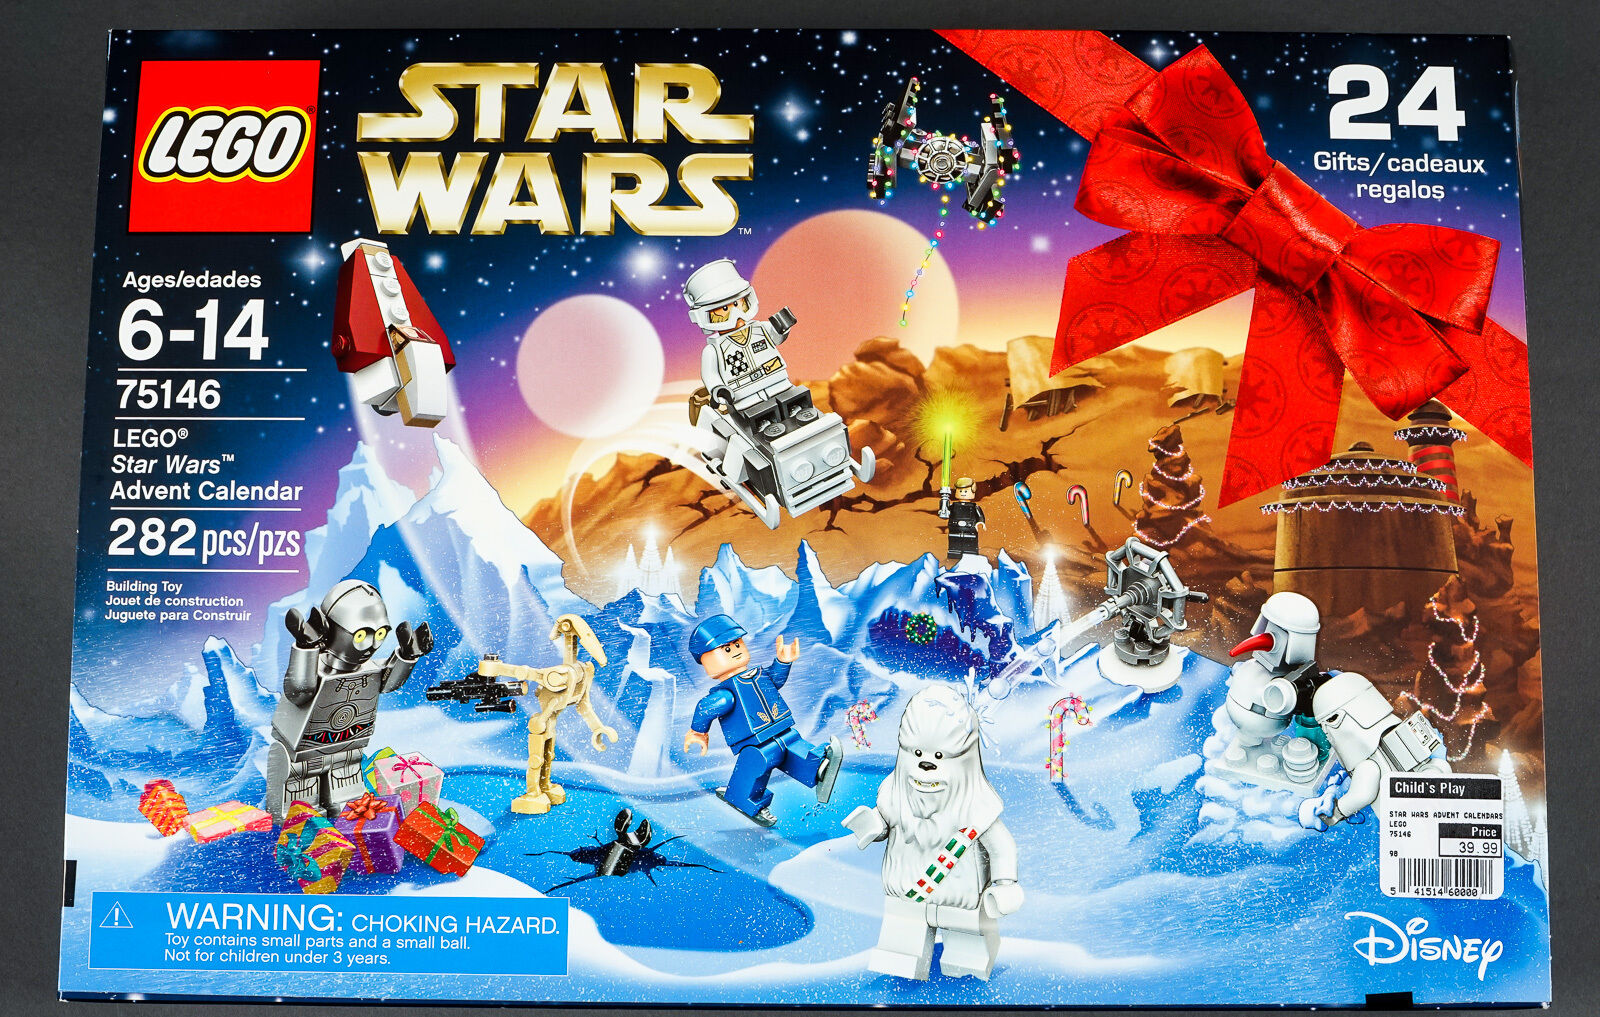 New In Box Lego Star Wars 2016 Advent Calendar Gifts Snow Chewbacca